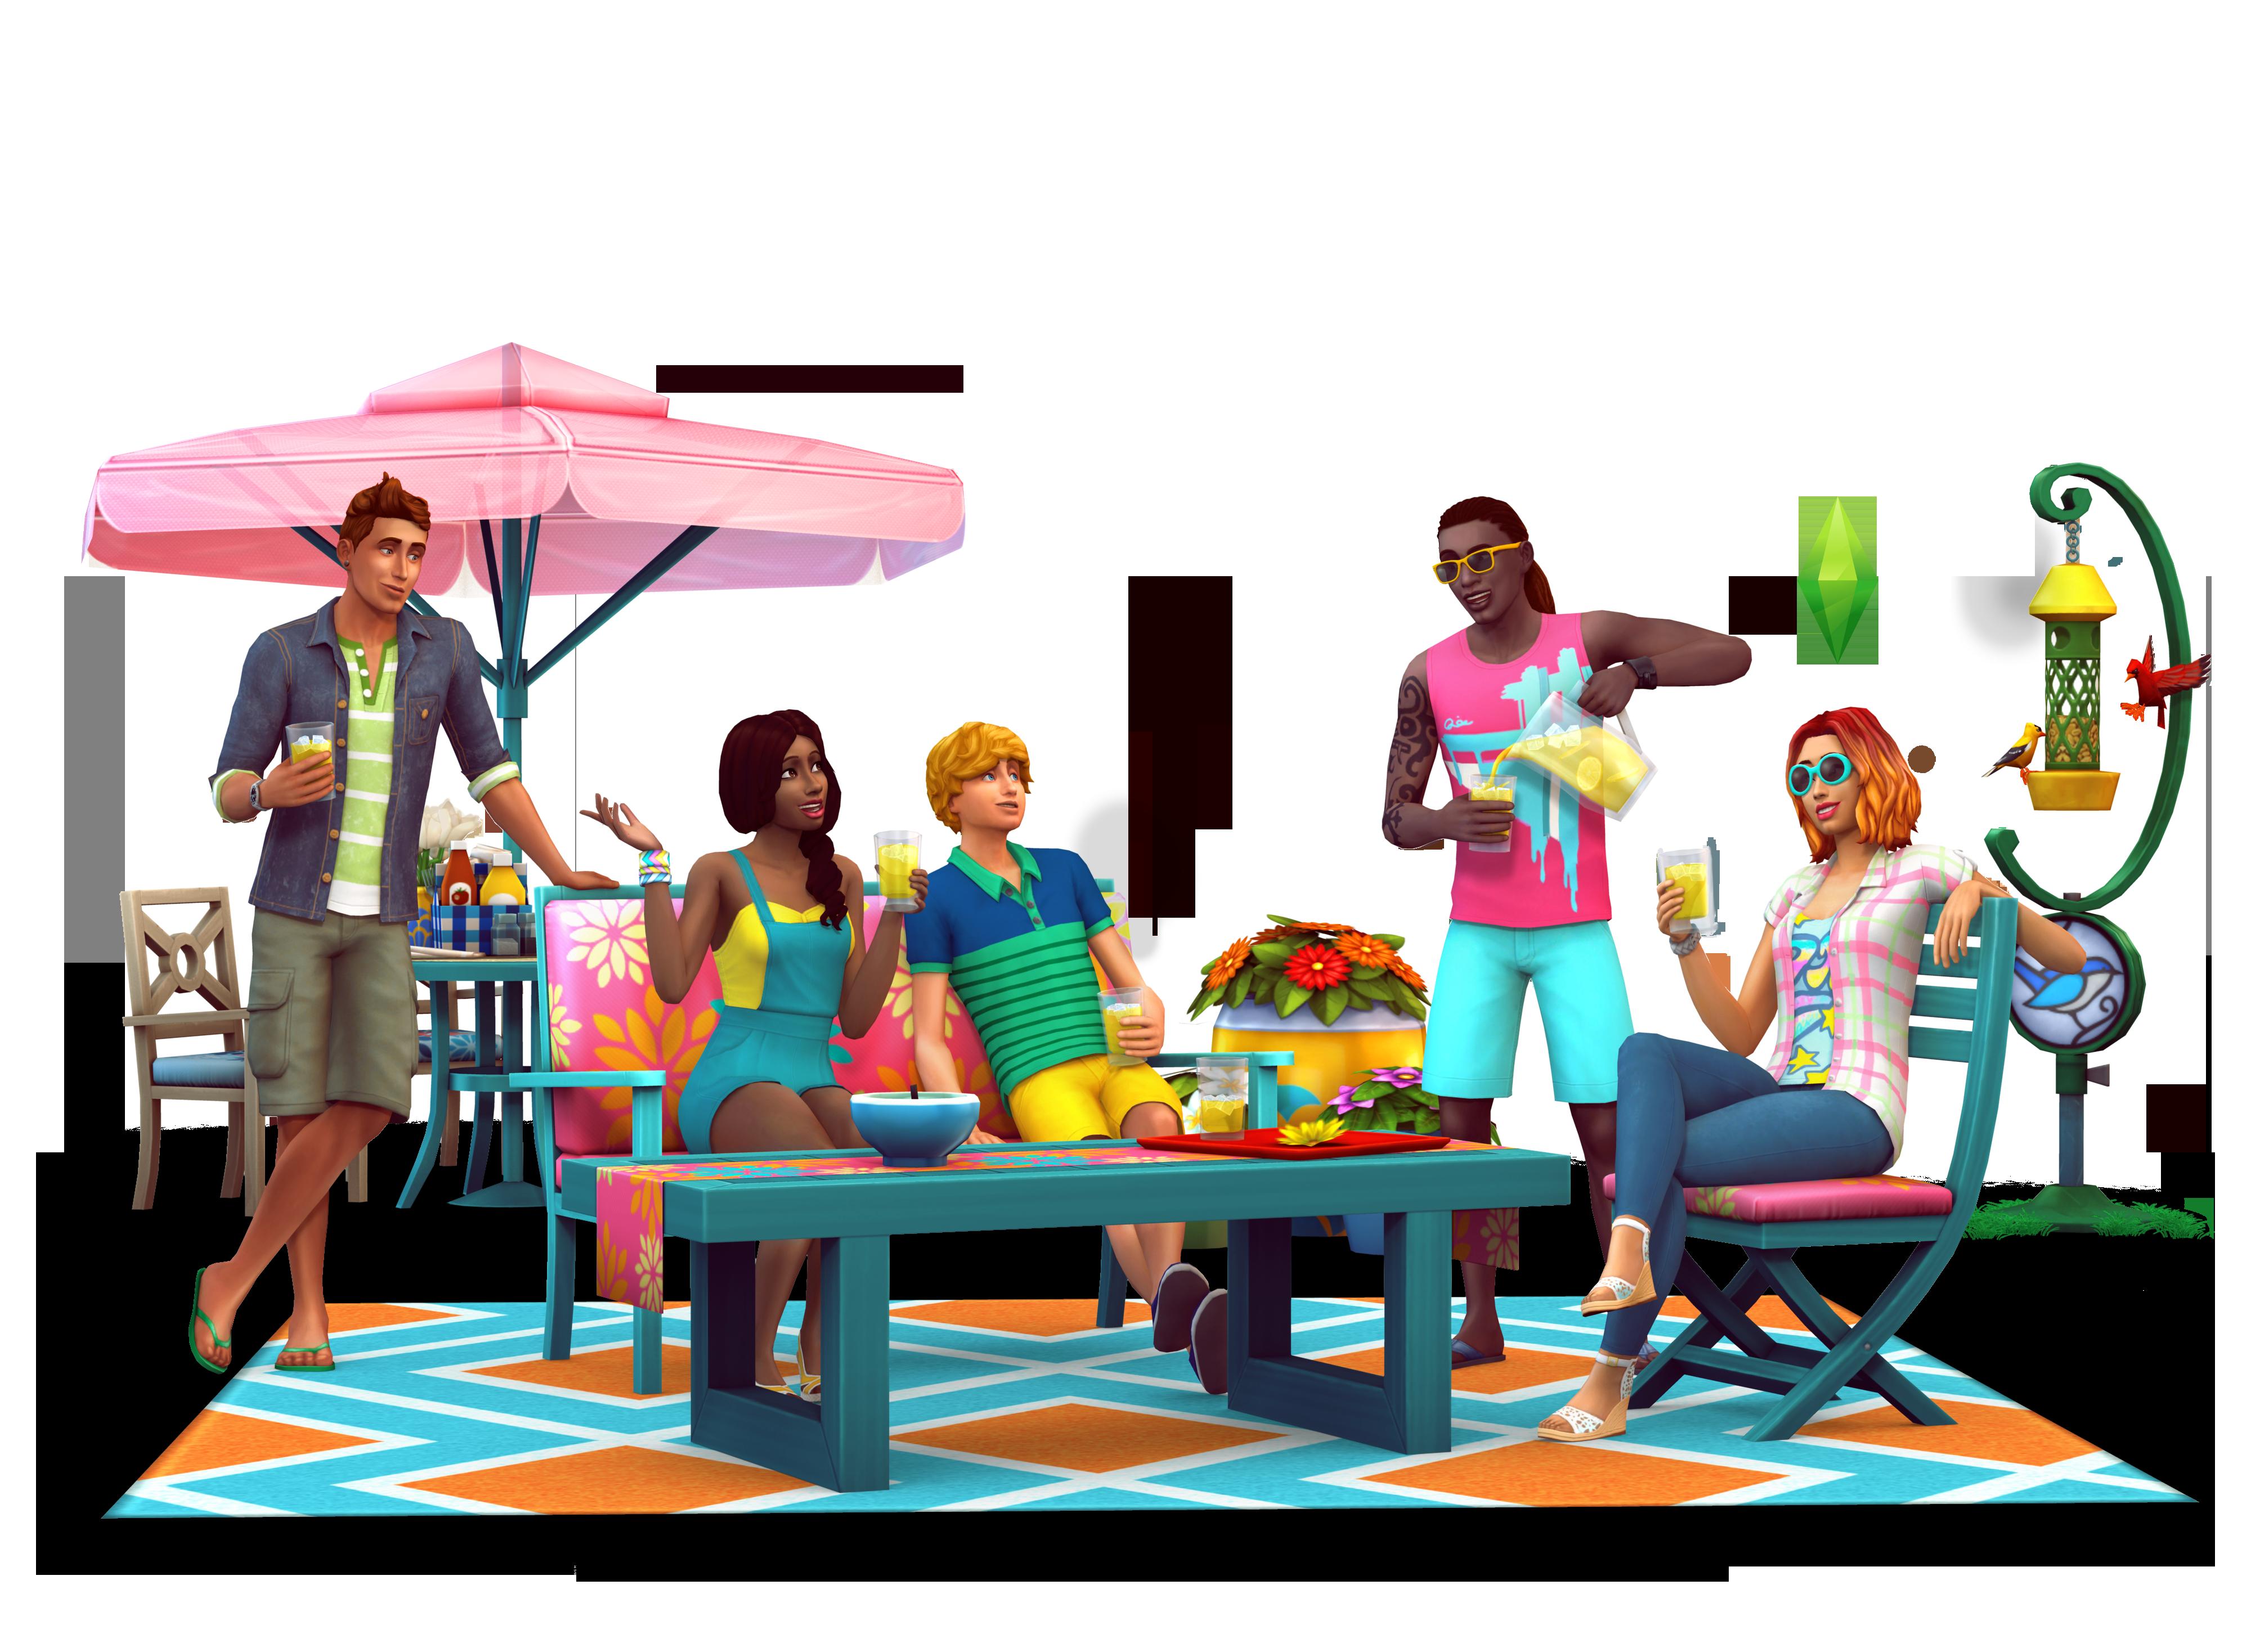 The Sims 4 Backyard Stuff: Official Box Art, Logo, And